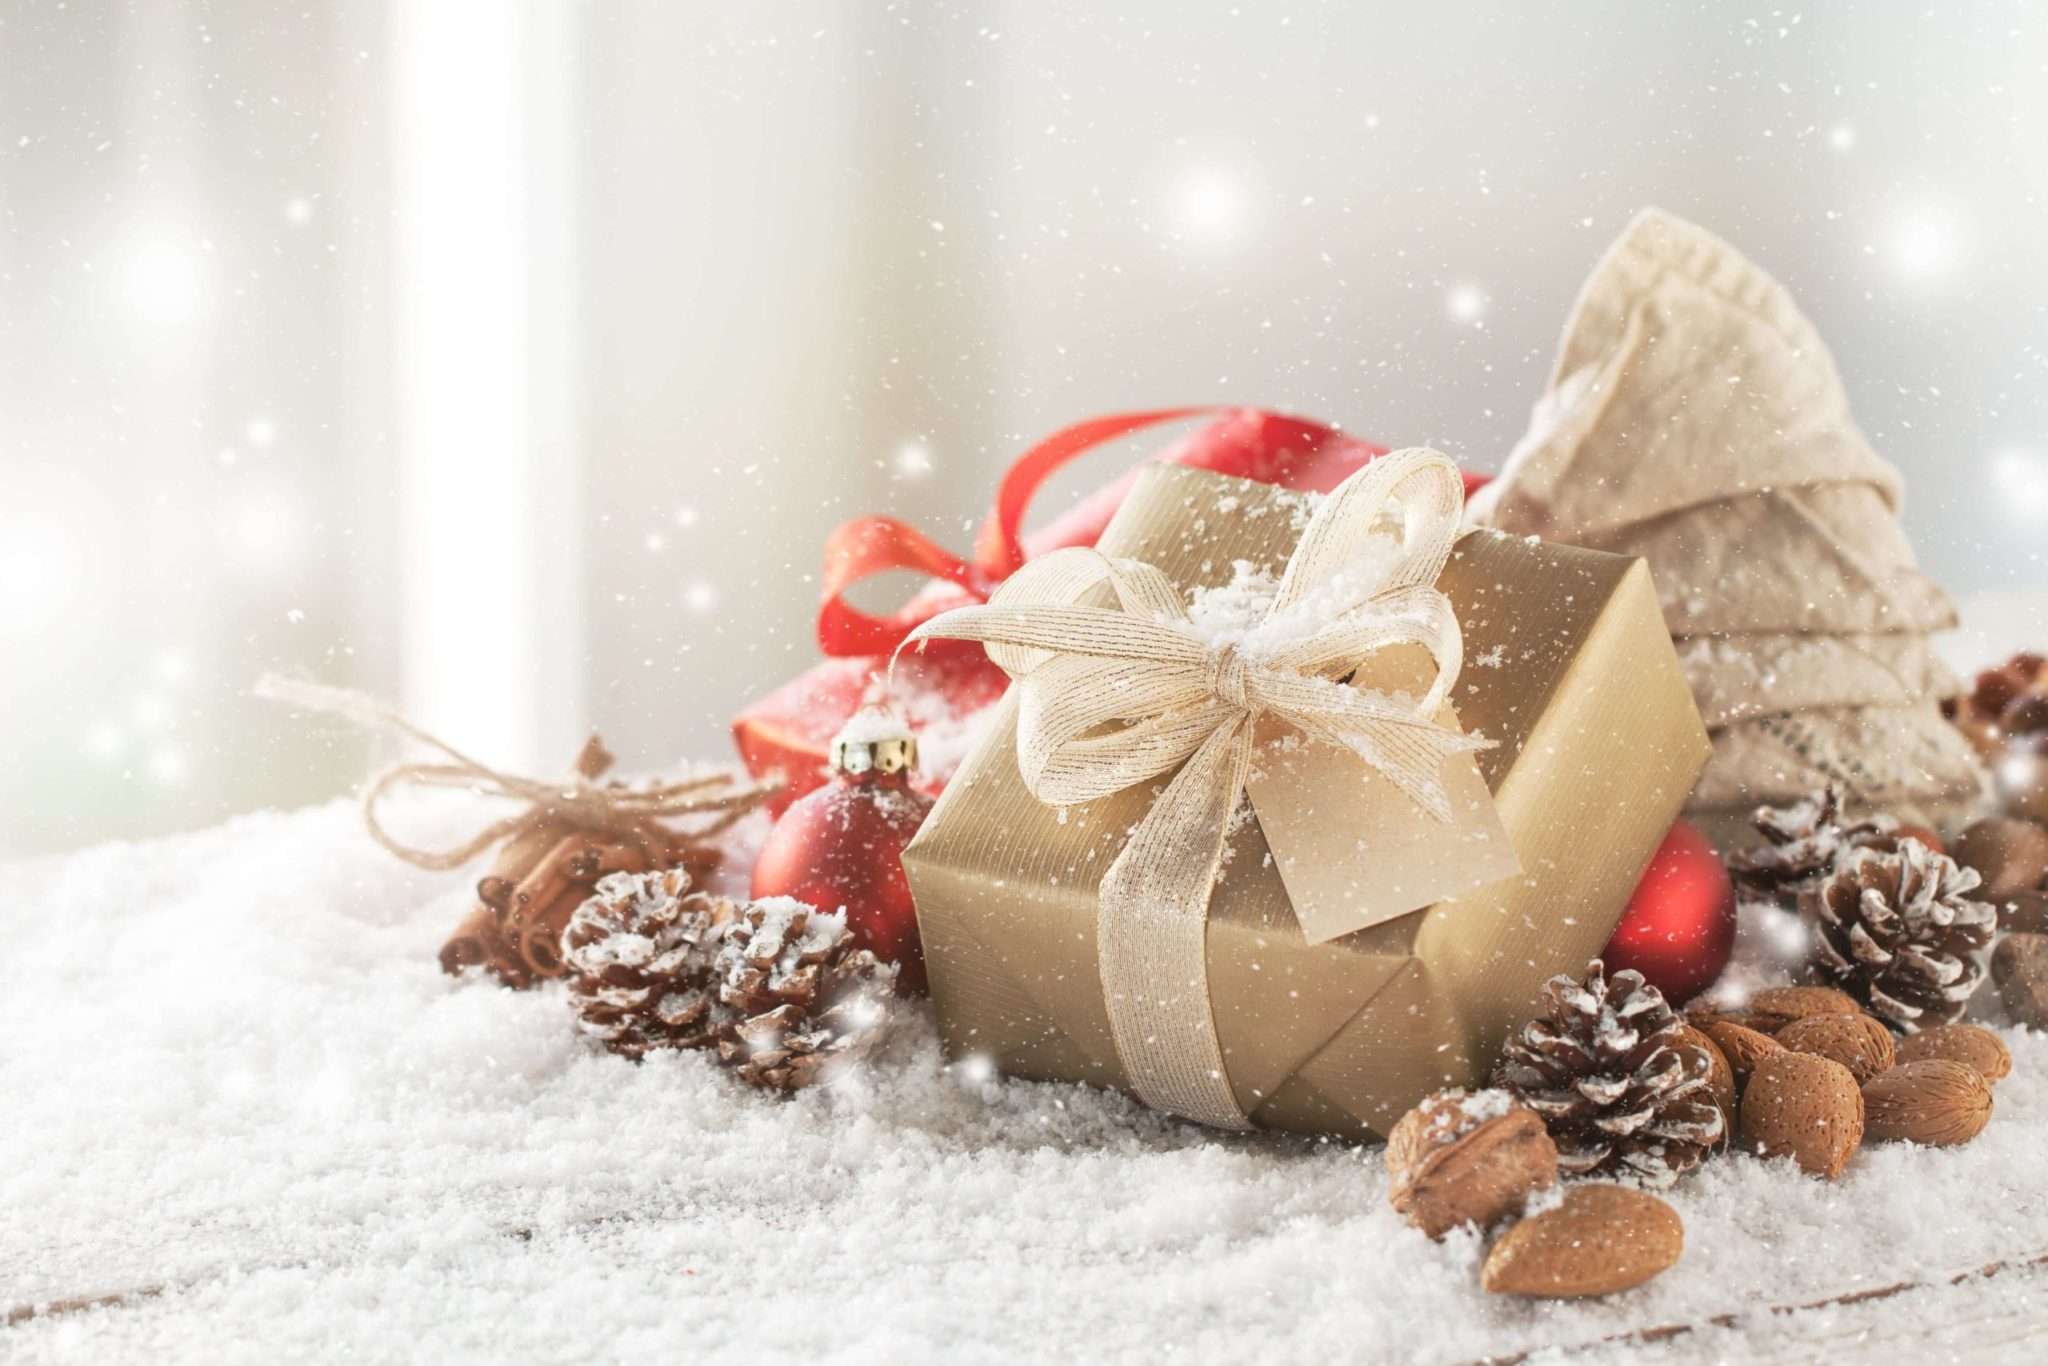 cadeau doré idée cadeau noel femme - Pranaloé